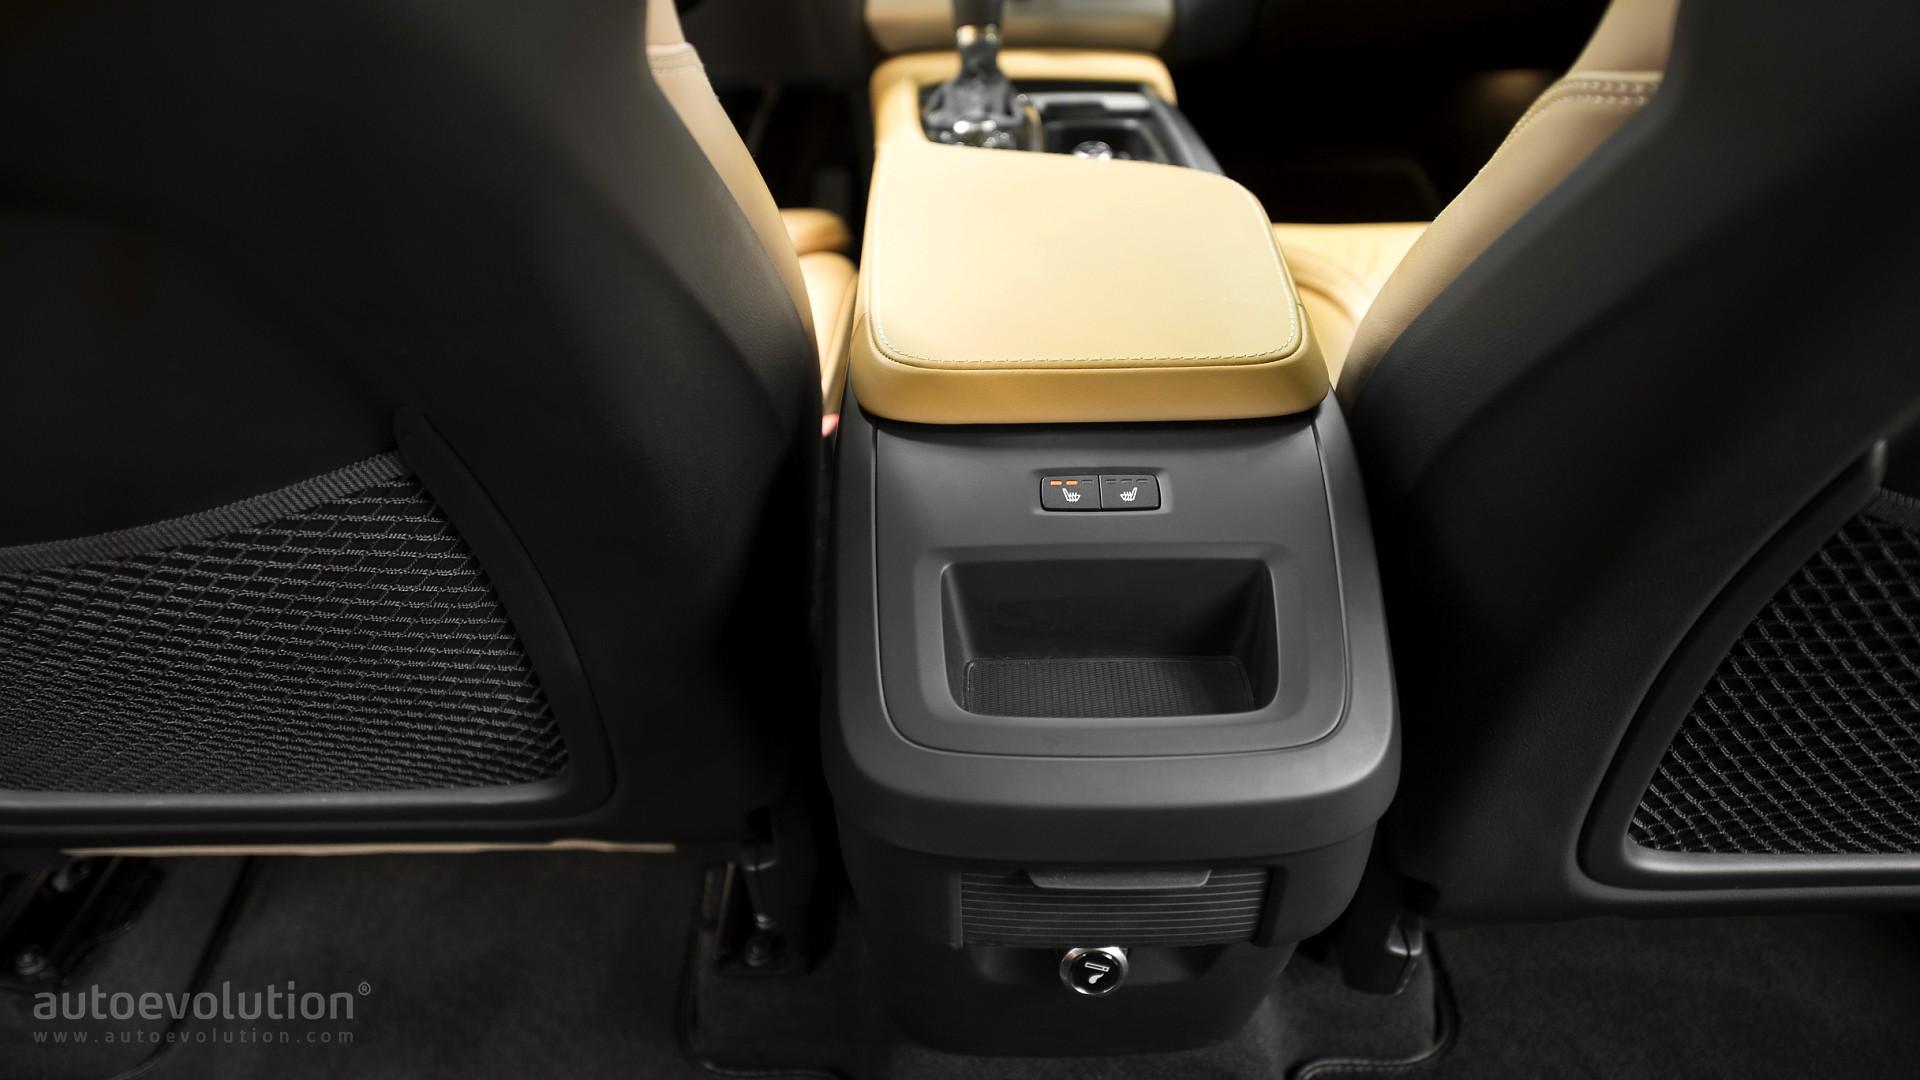 Volvo S60: Heated rear seats